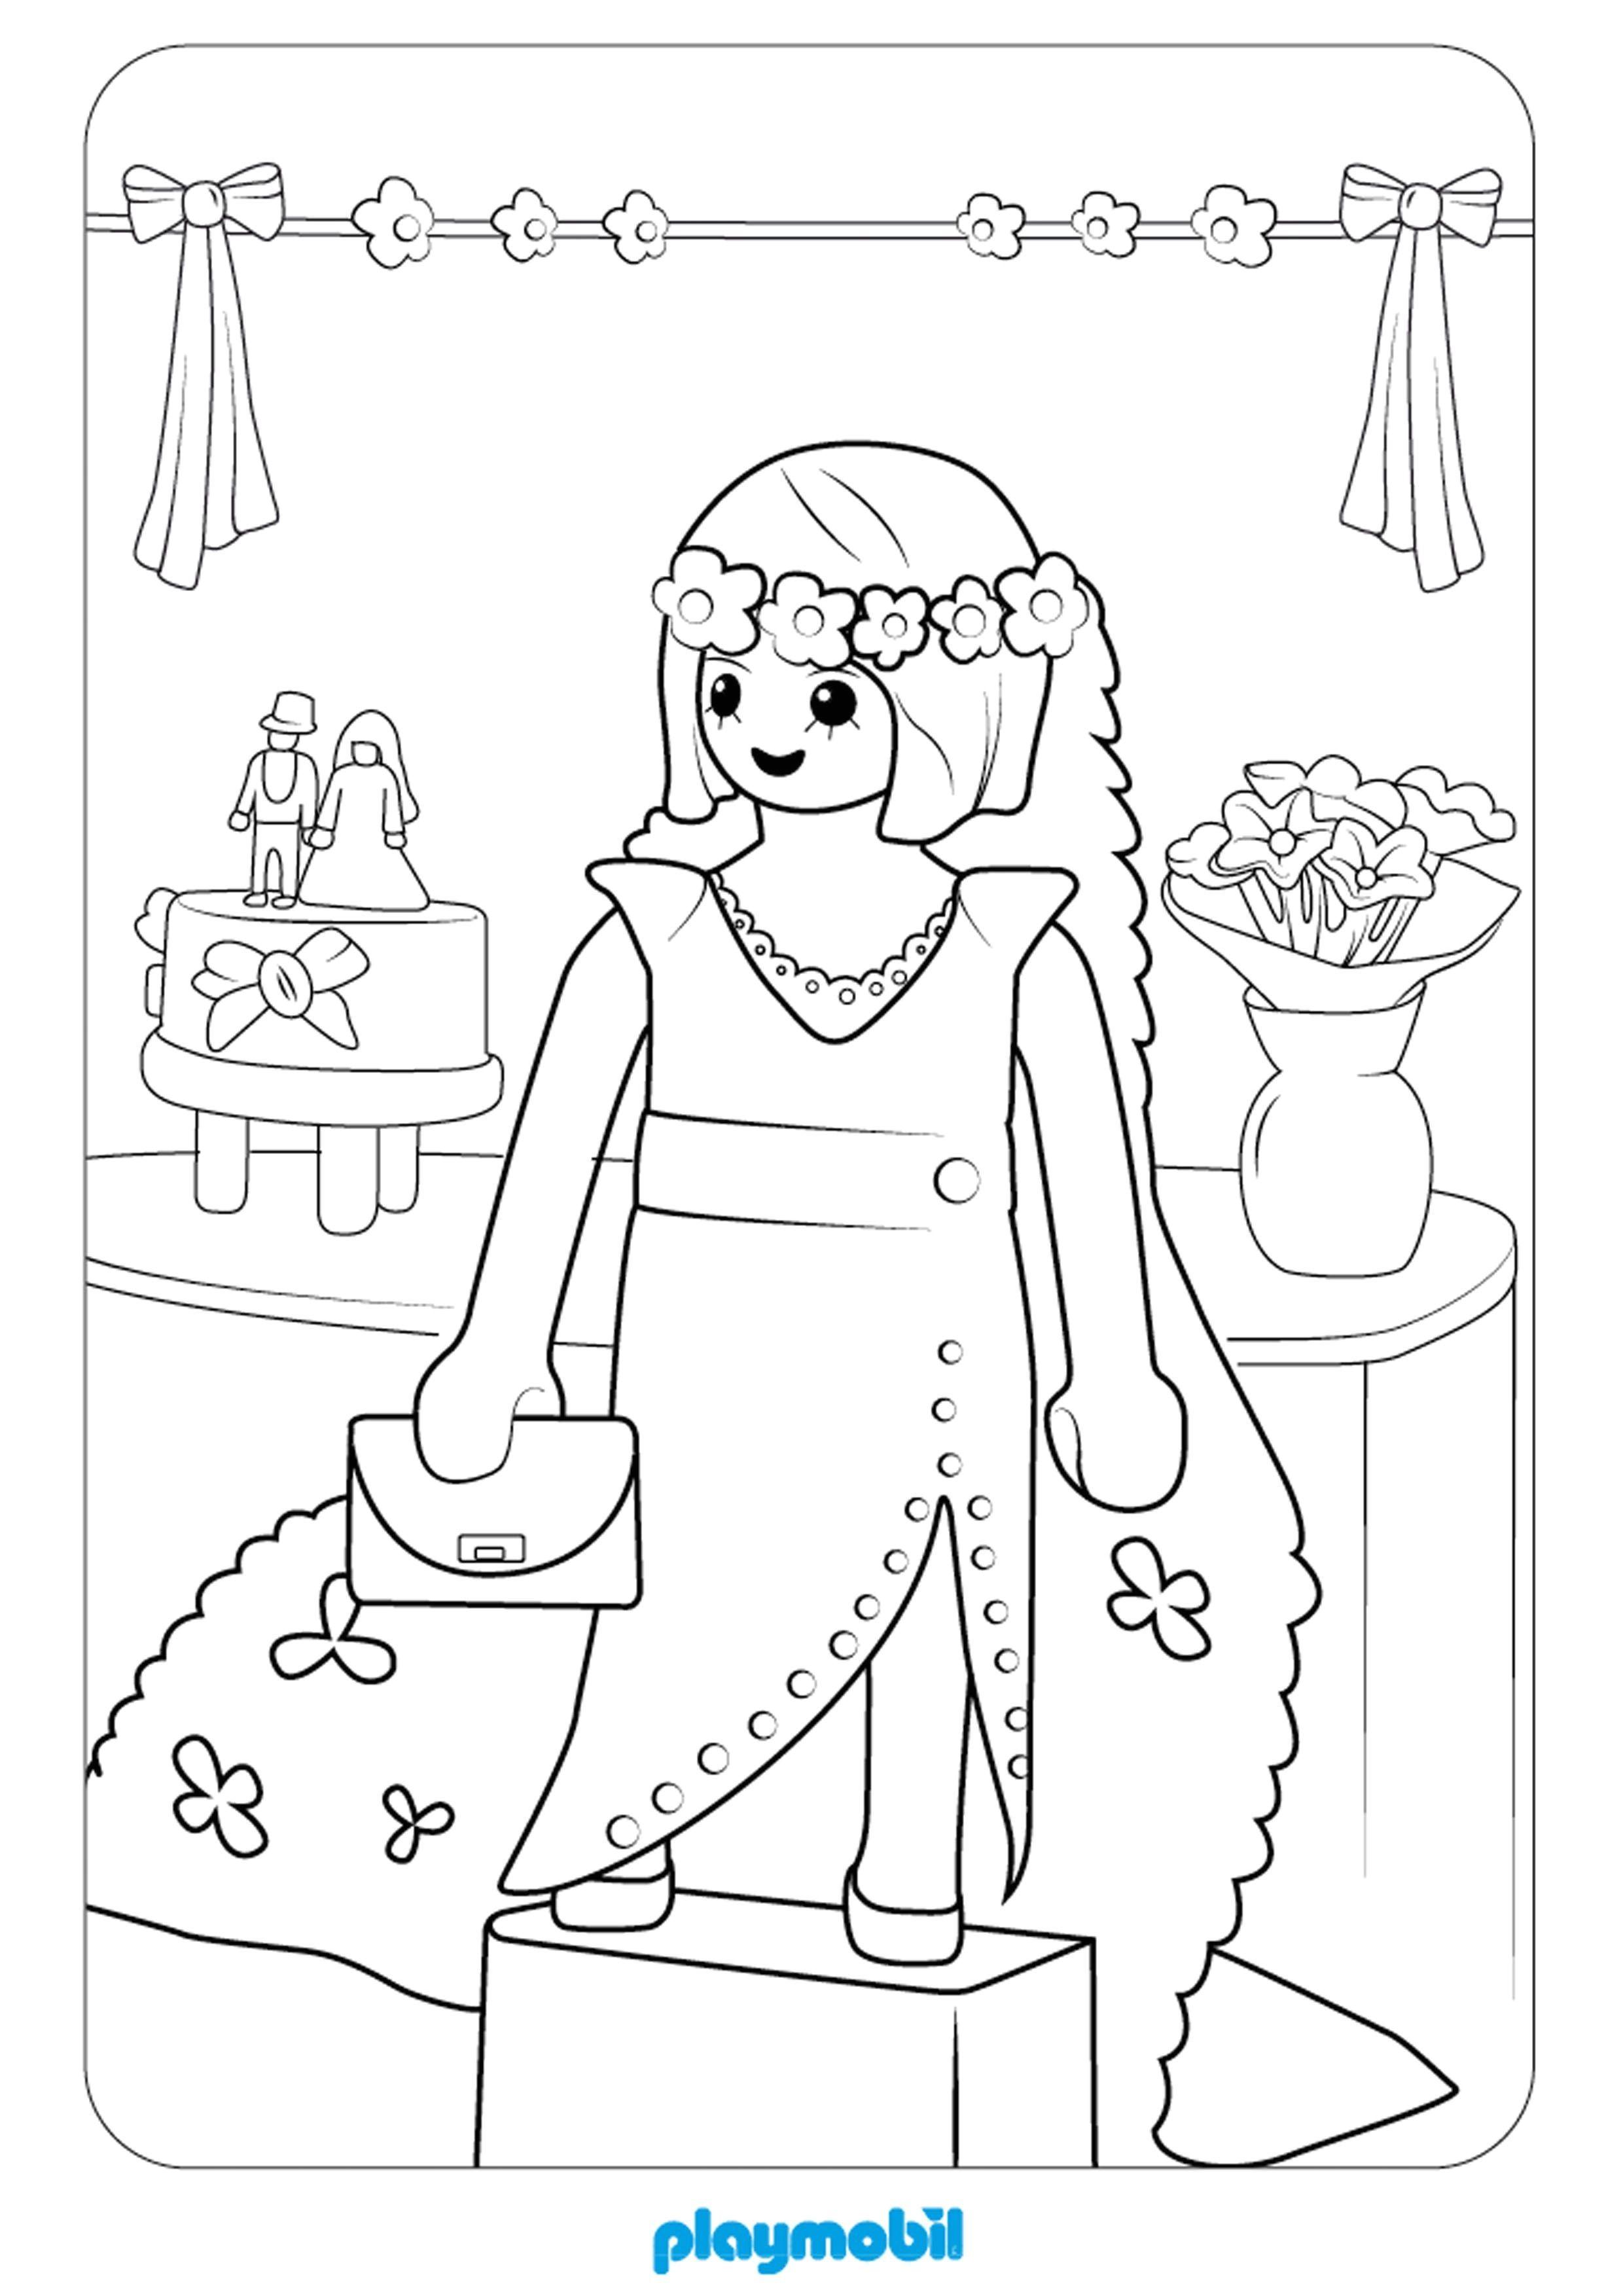 15 Plus Recent Coloriage Vaiana A Imprimer Gratuit Stock Coloriage Coloriage Gratuit Coloriage Vaiana